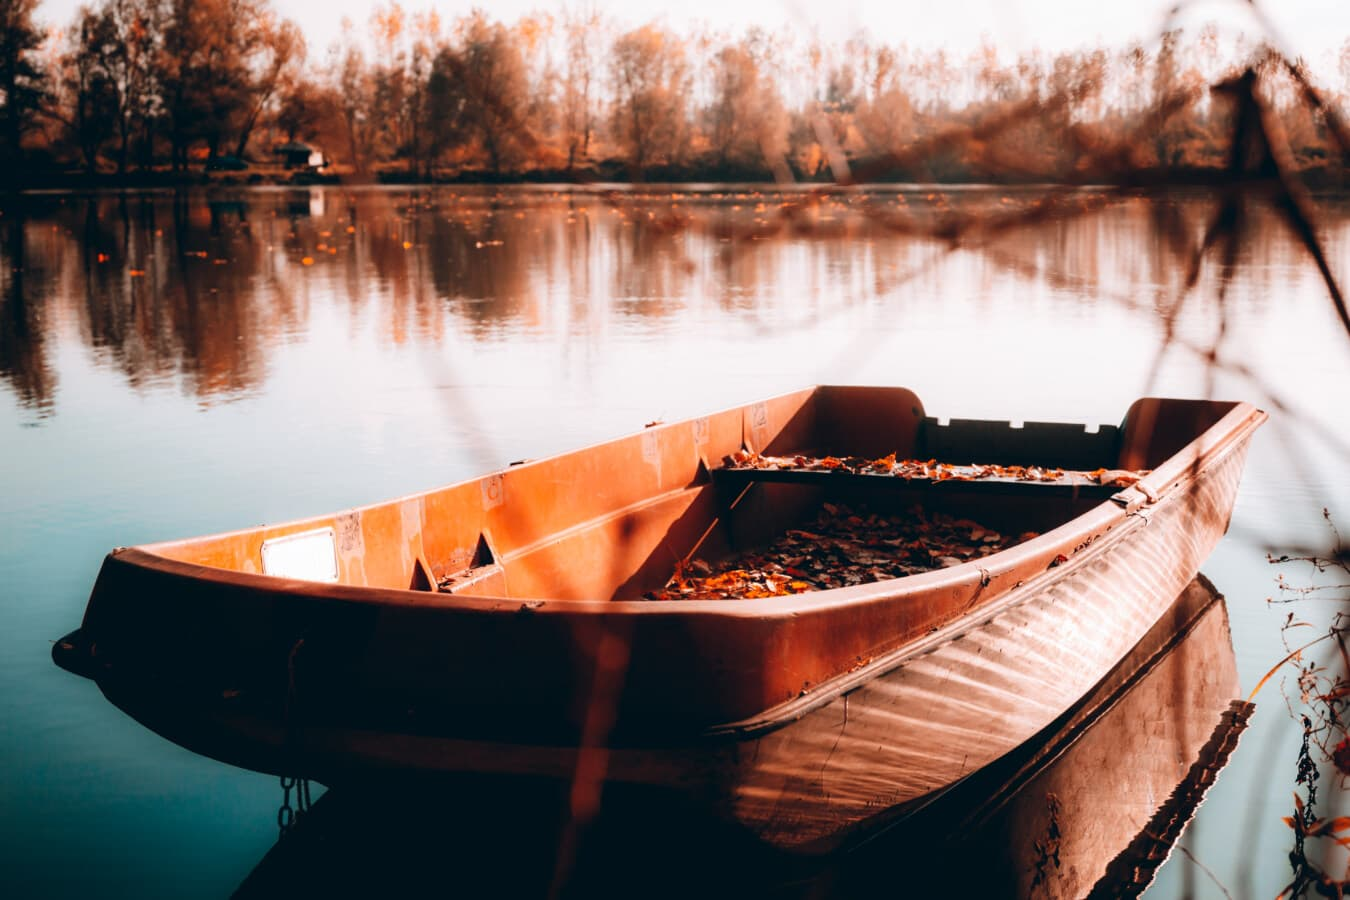 Kunststoff, Angelboot/Fischerboot, Herbstsaison, Ruhe, Atmosphäre, Boot, Wasser, Sonnenuntergang, See, Dämmerung